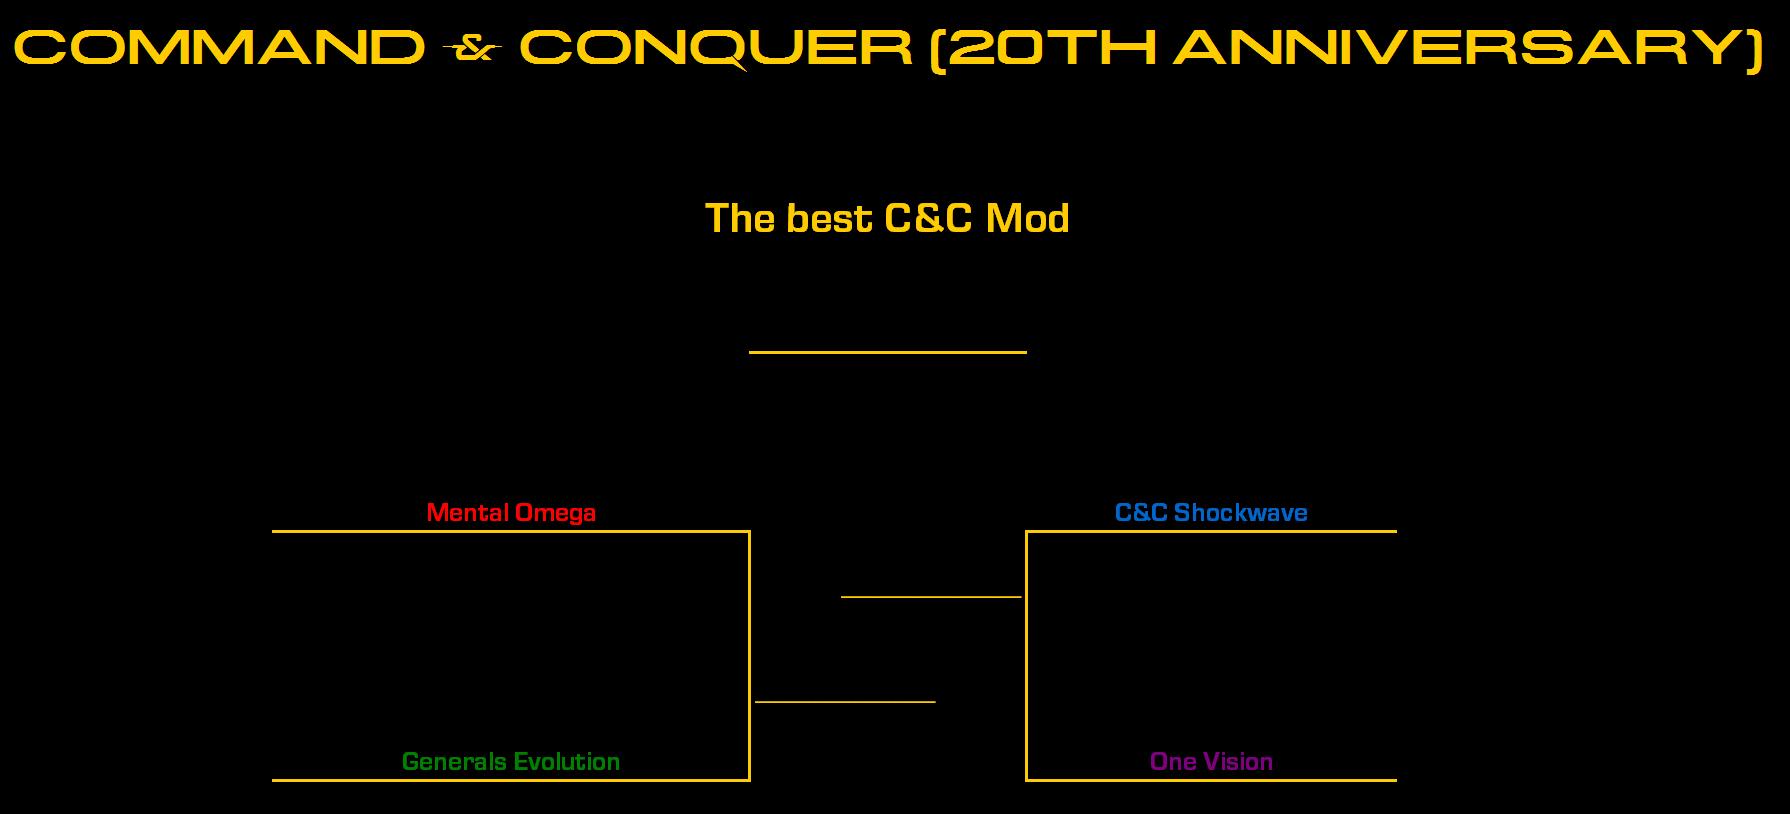 BestCNCModOverall 1